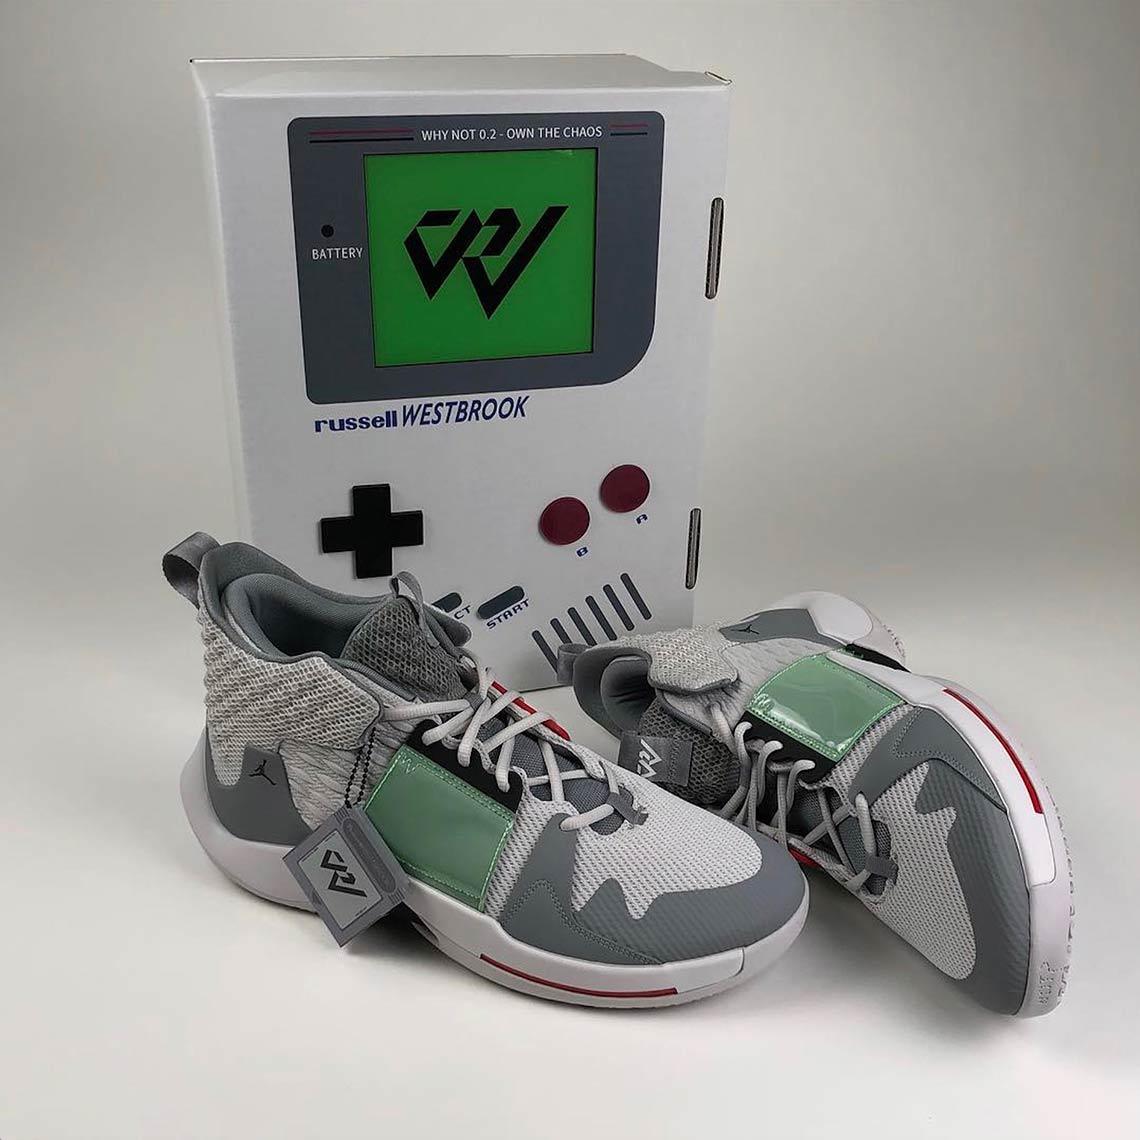 new product 80ab2 d63e3 Jordan Why Not Zer0.2 Nintendo Game Boy Info | SneakerNews.com